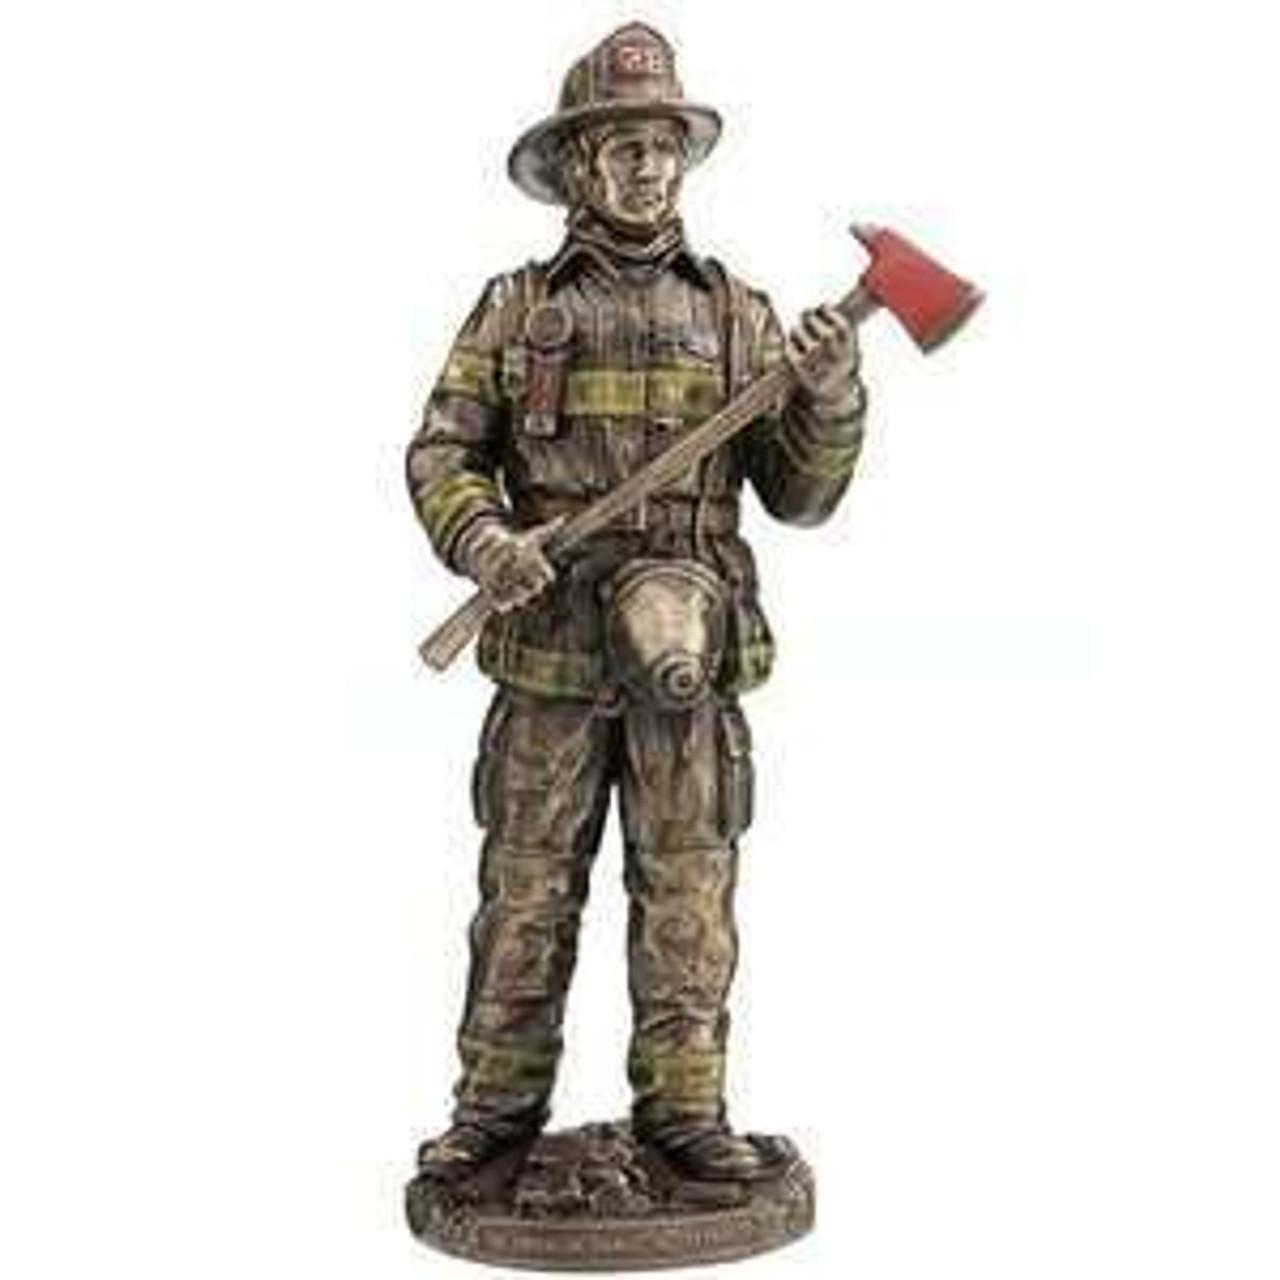 Fireman Statues